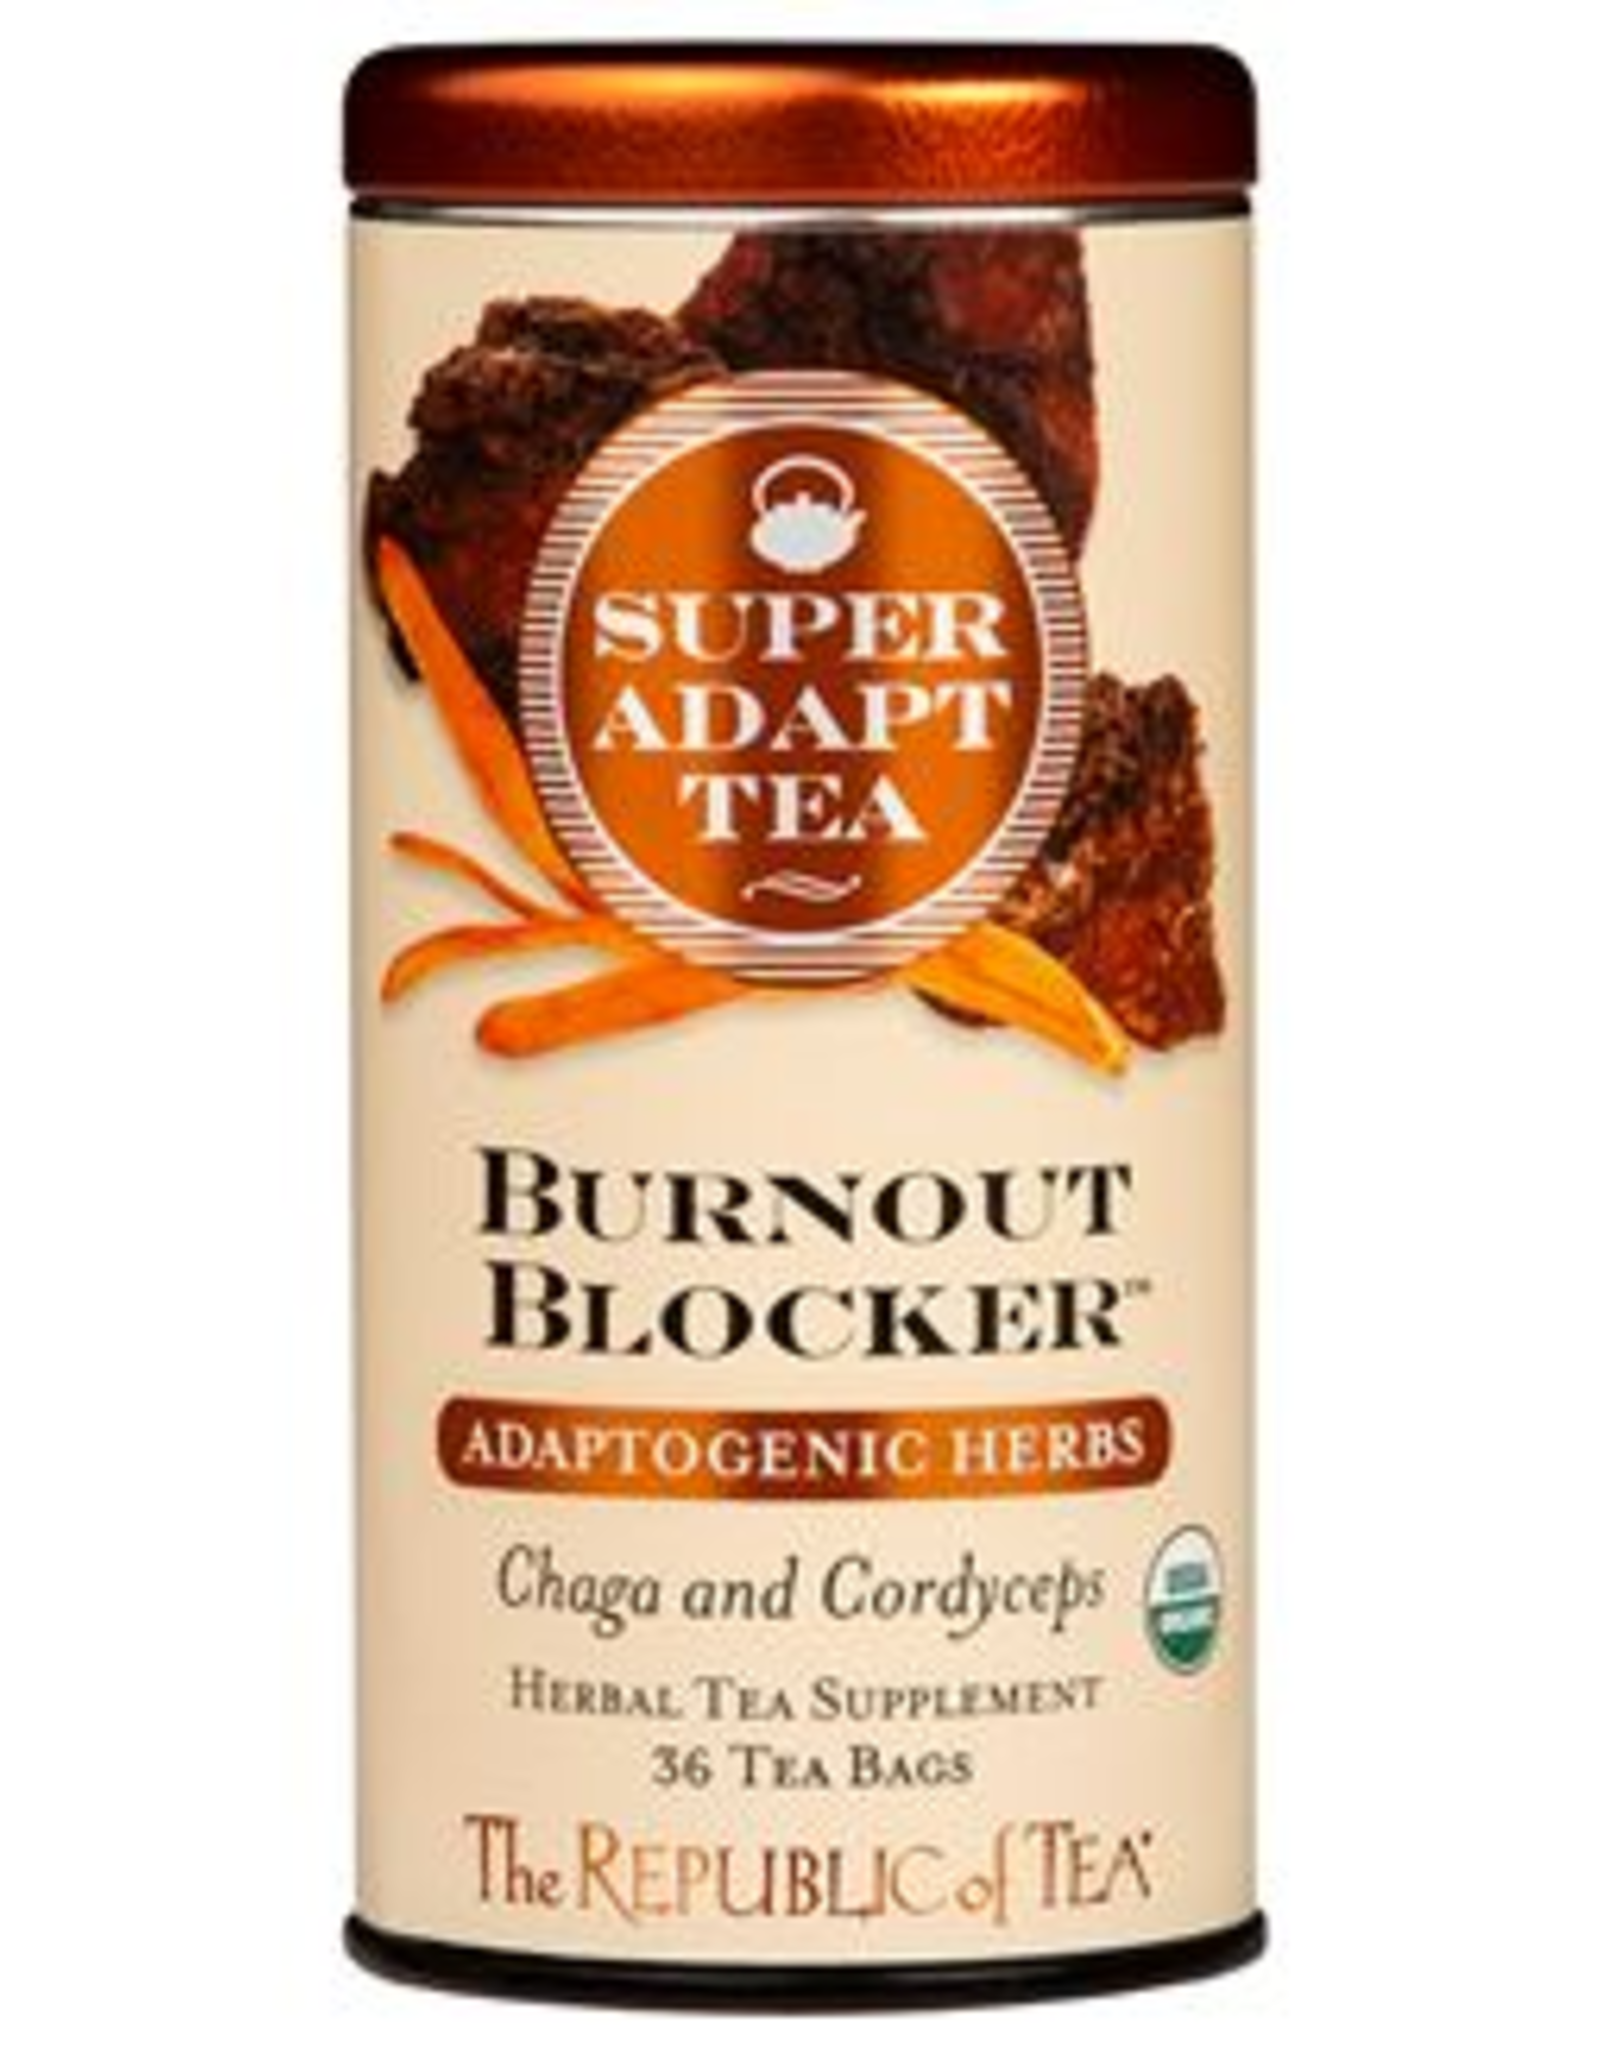 The Republic of Tea Burnout Blocker Tea 36 Bag Tin